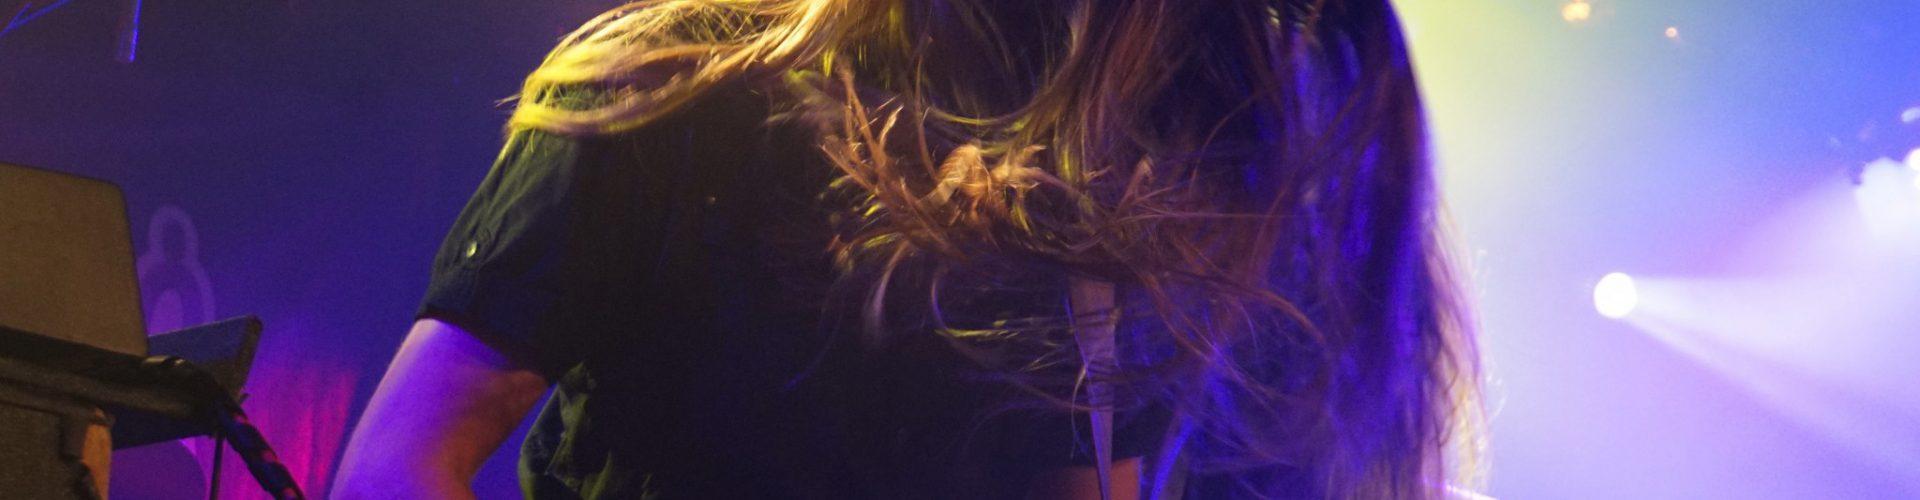 Fotostrecke: Purple Rising und Beyond the Rainbow im Colos-Saal